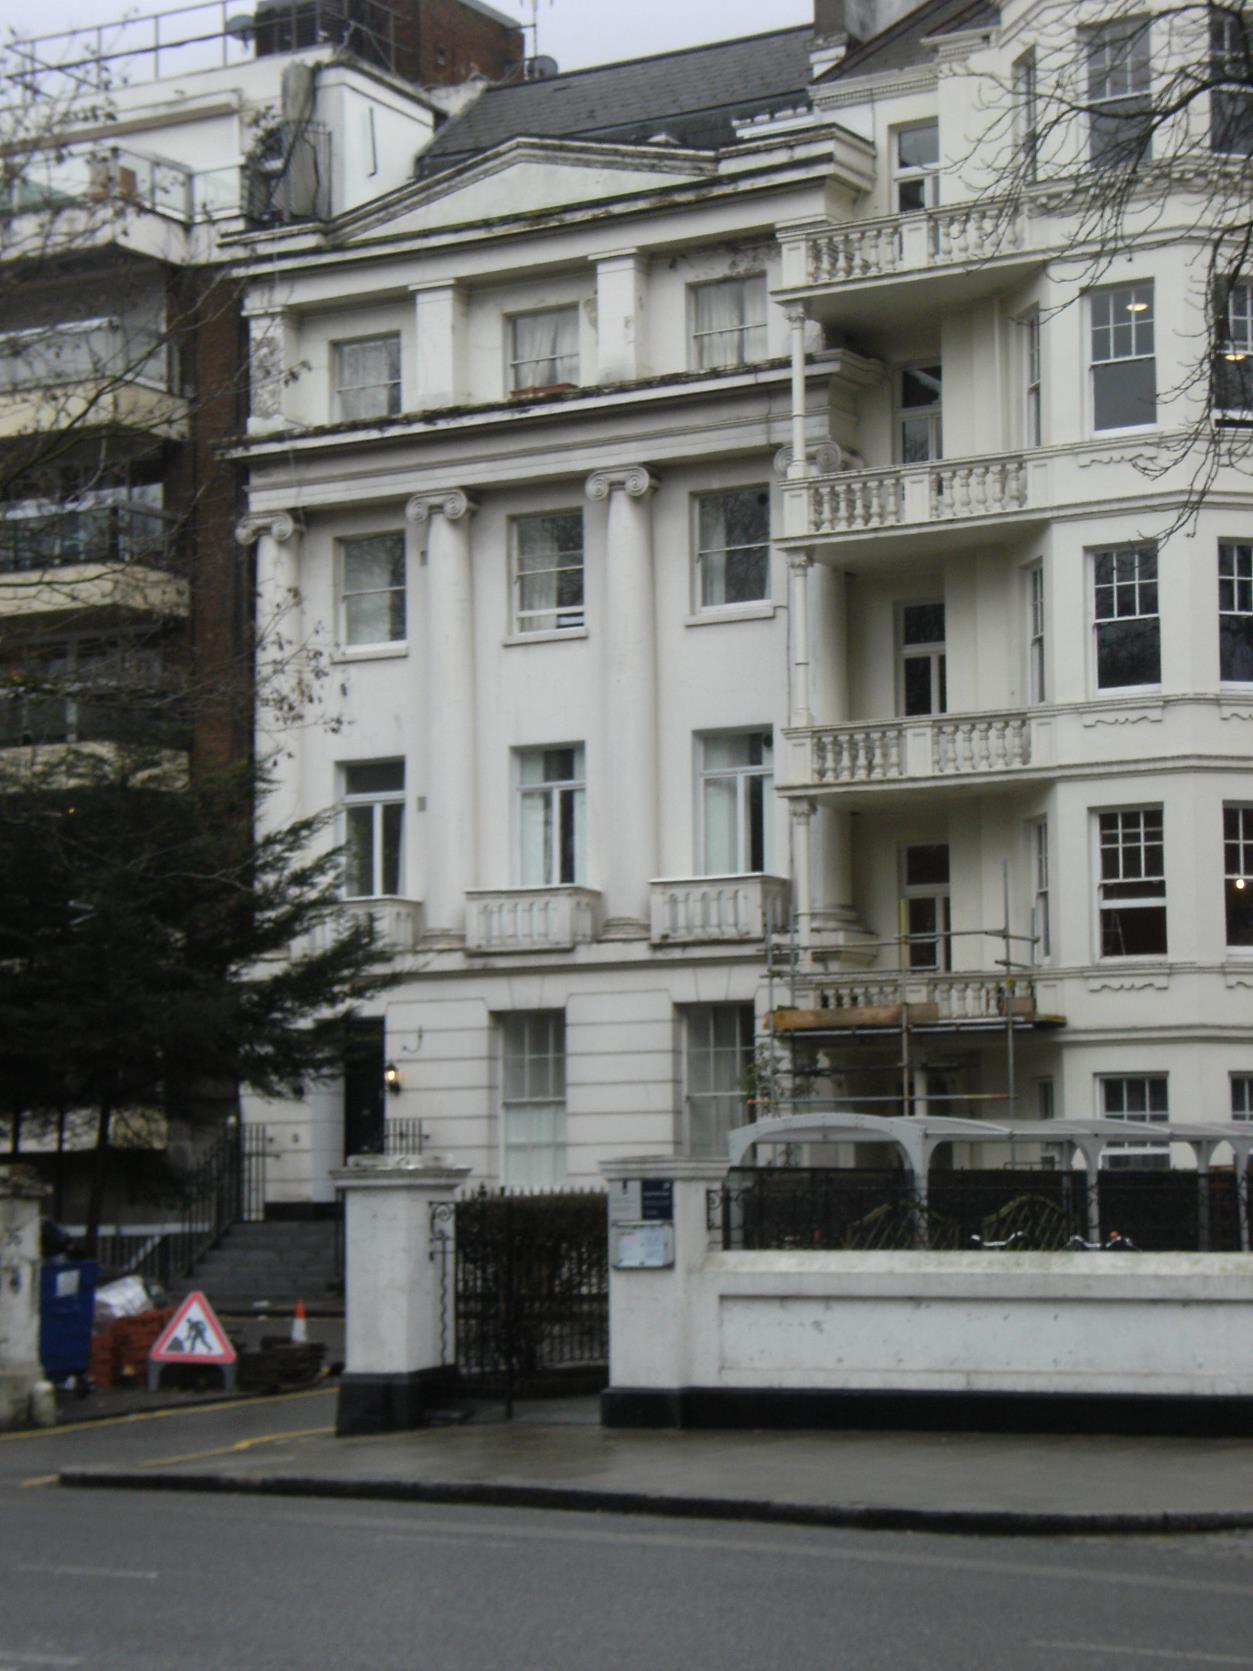 Royal Borough of Kensington & Chelsea landlord prosecution - Hyde Park Gate, London SW7